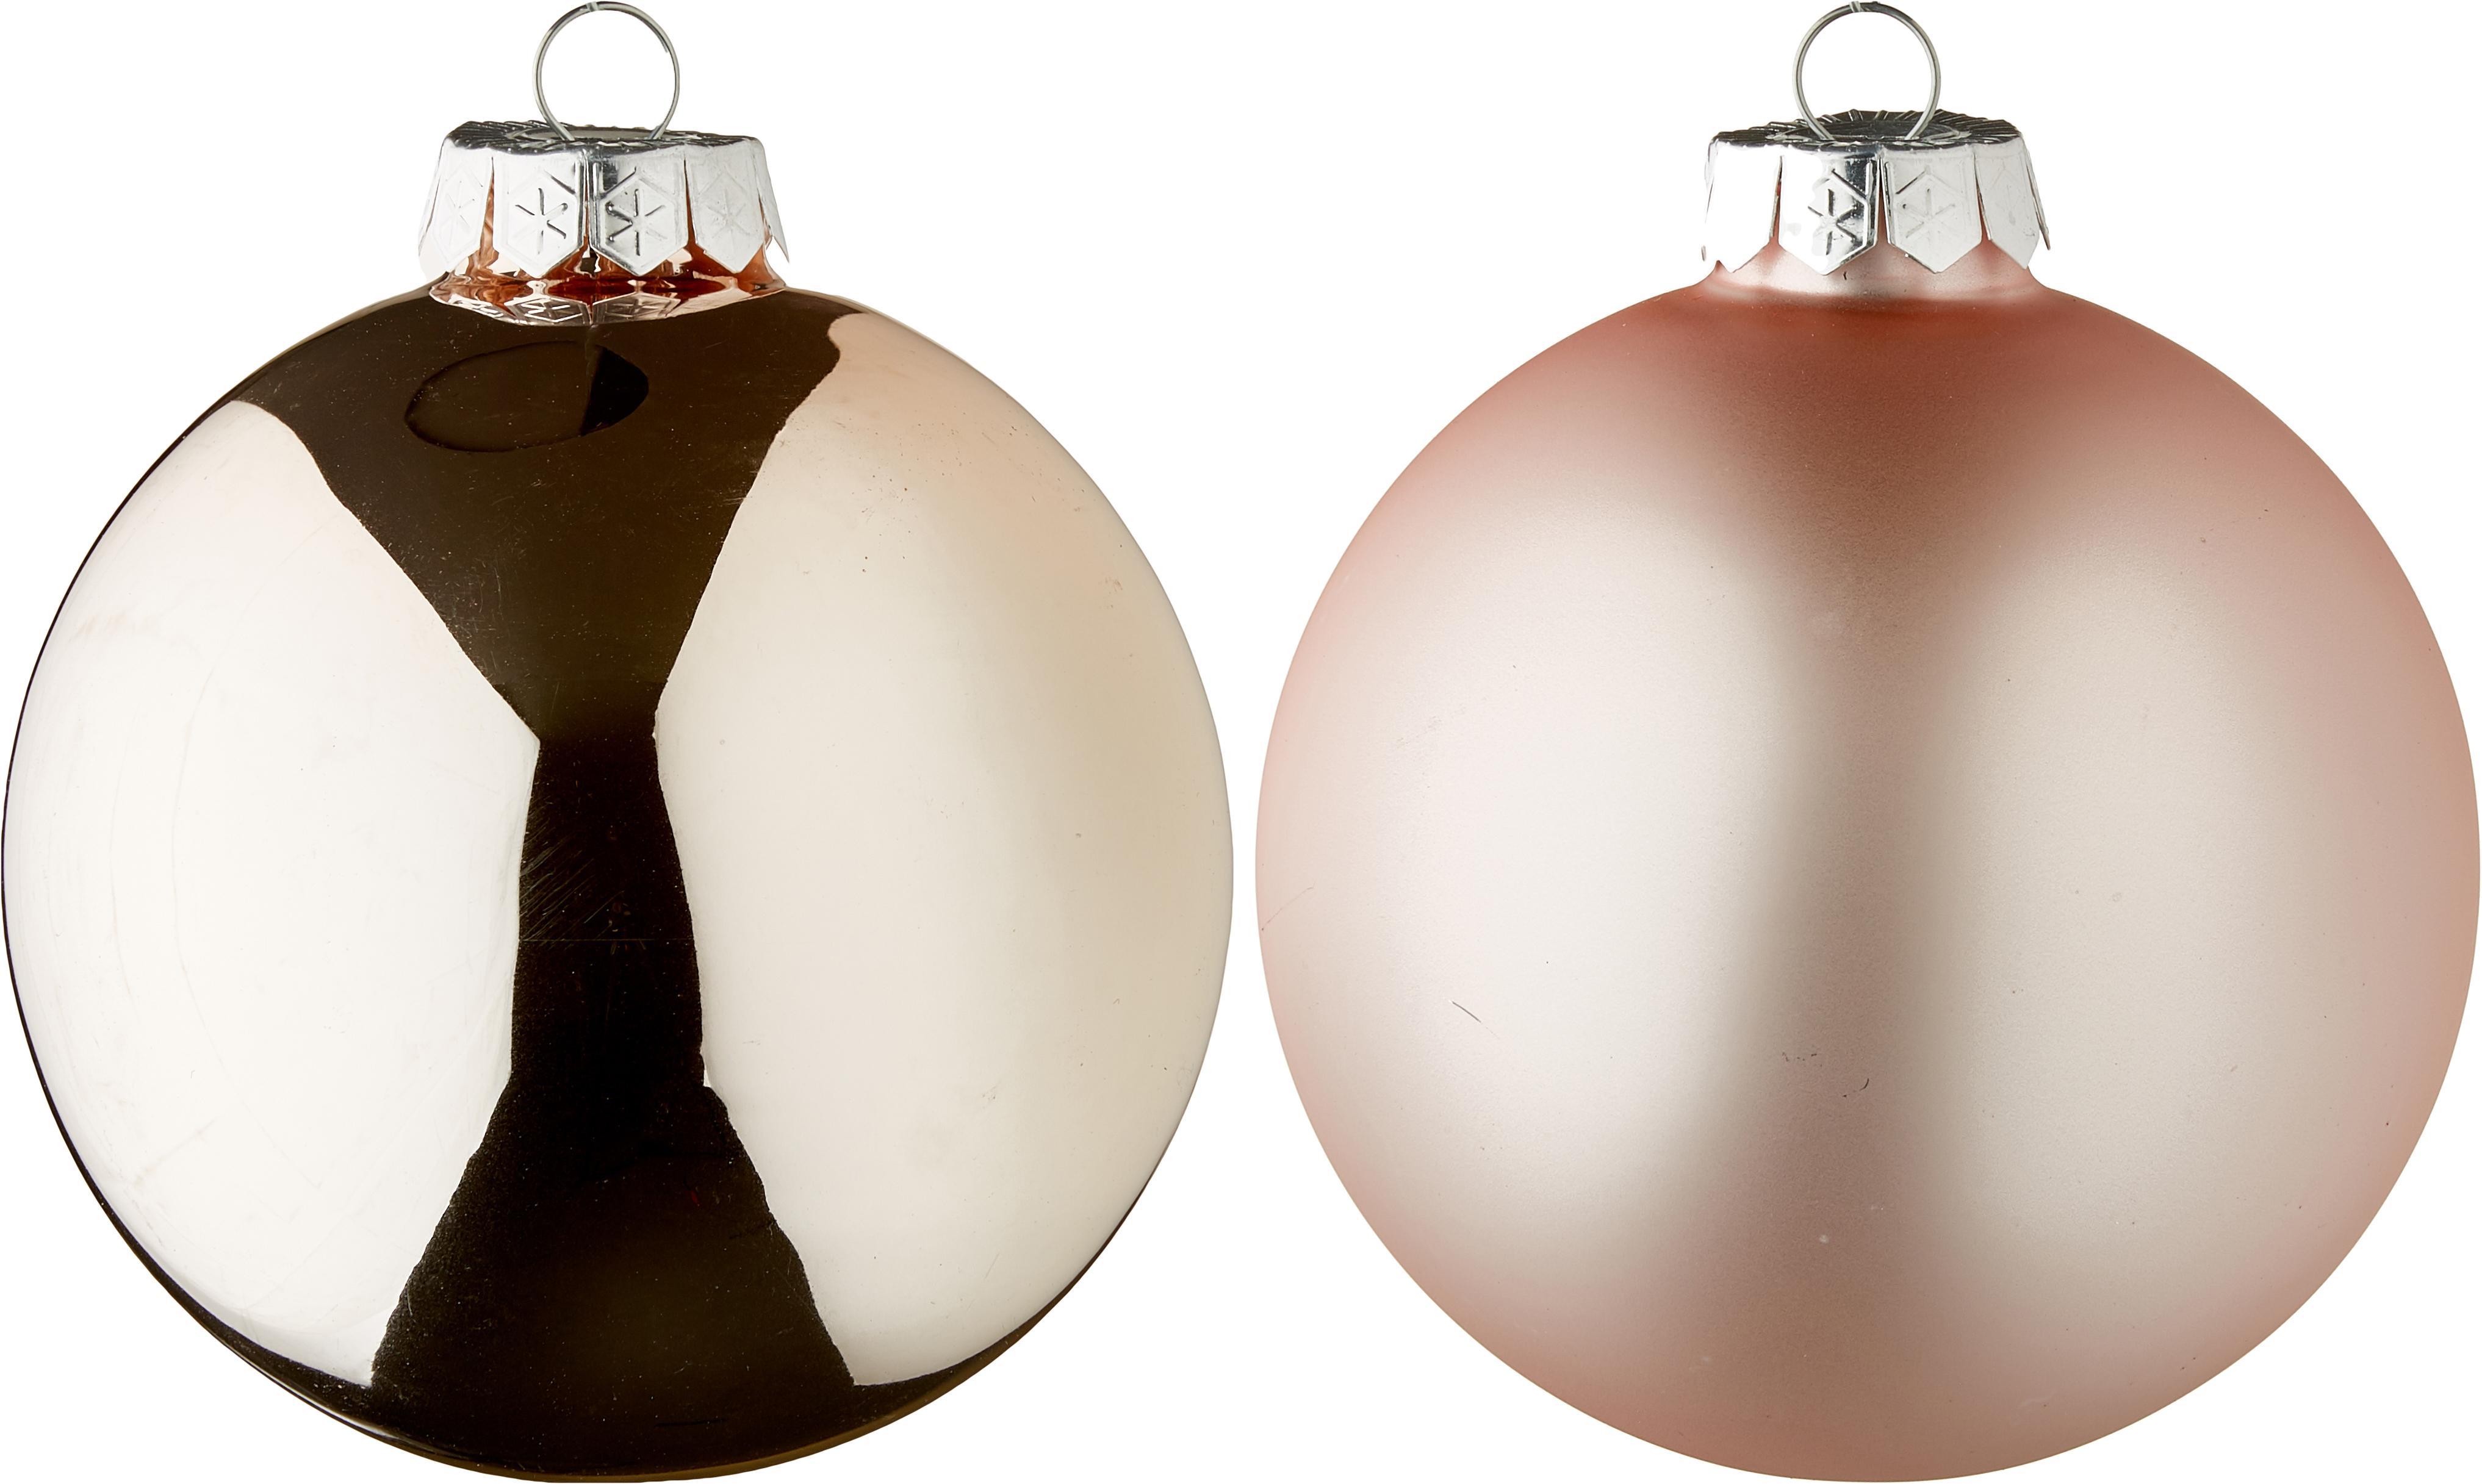 Weihnachtskugel-Set Lorene Ø10cm, 4-tlg., Rosa, matt und glänzend, Ø 10 cm